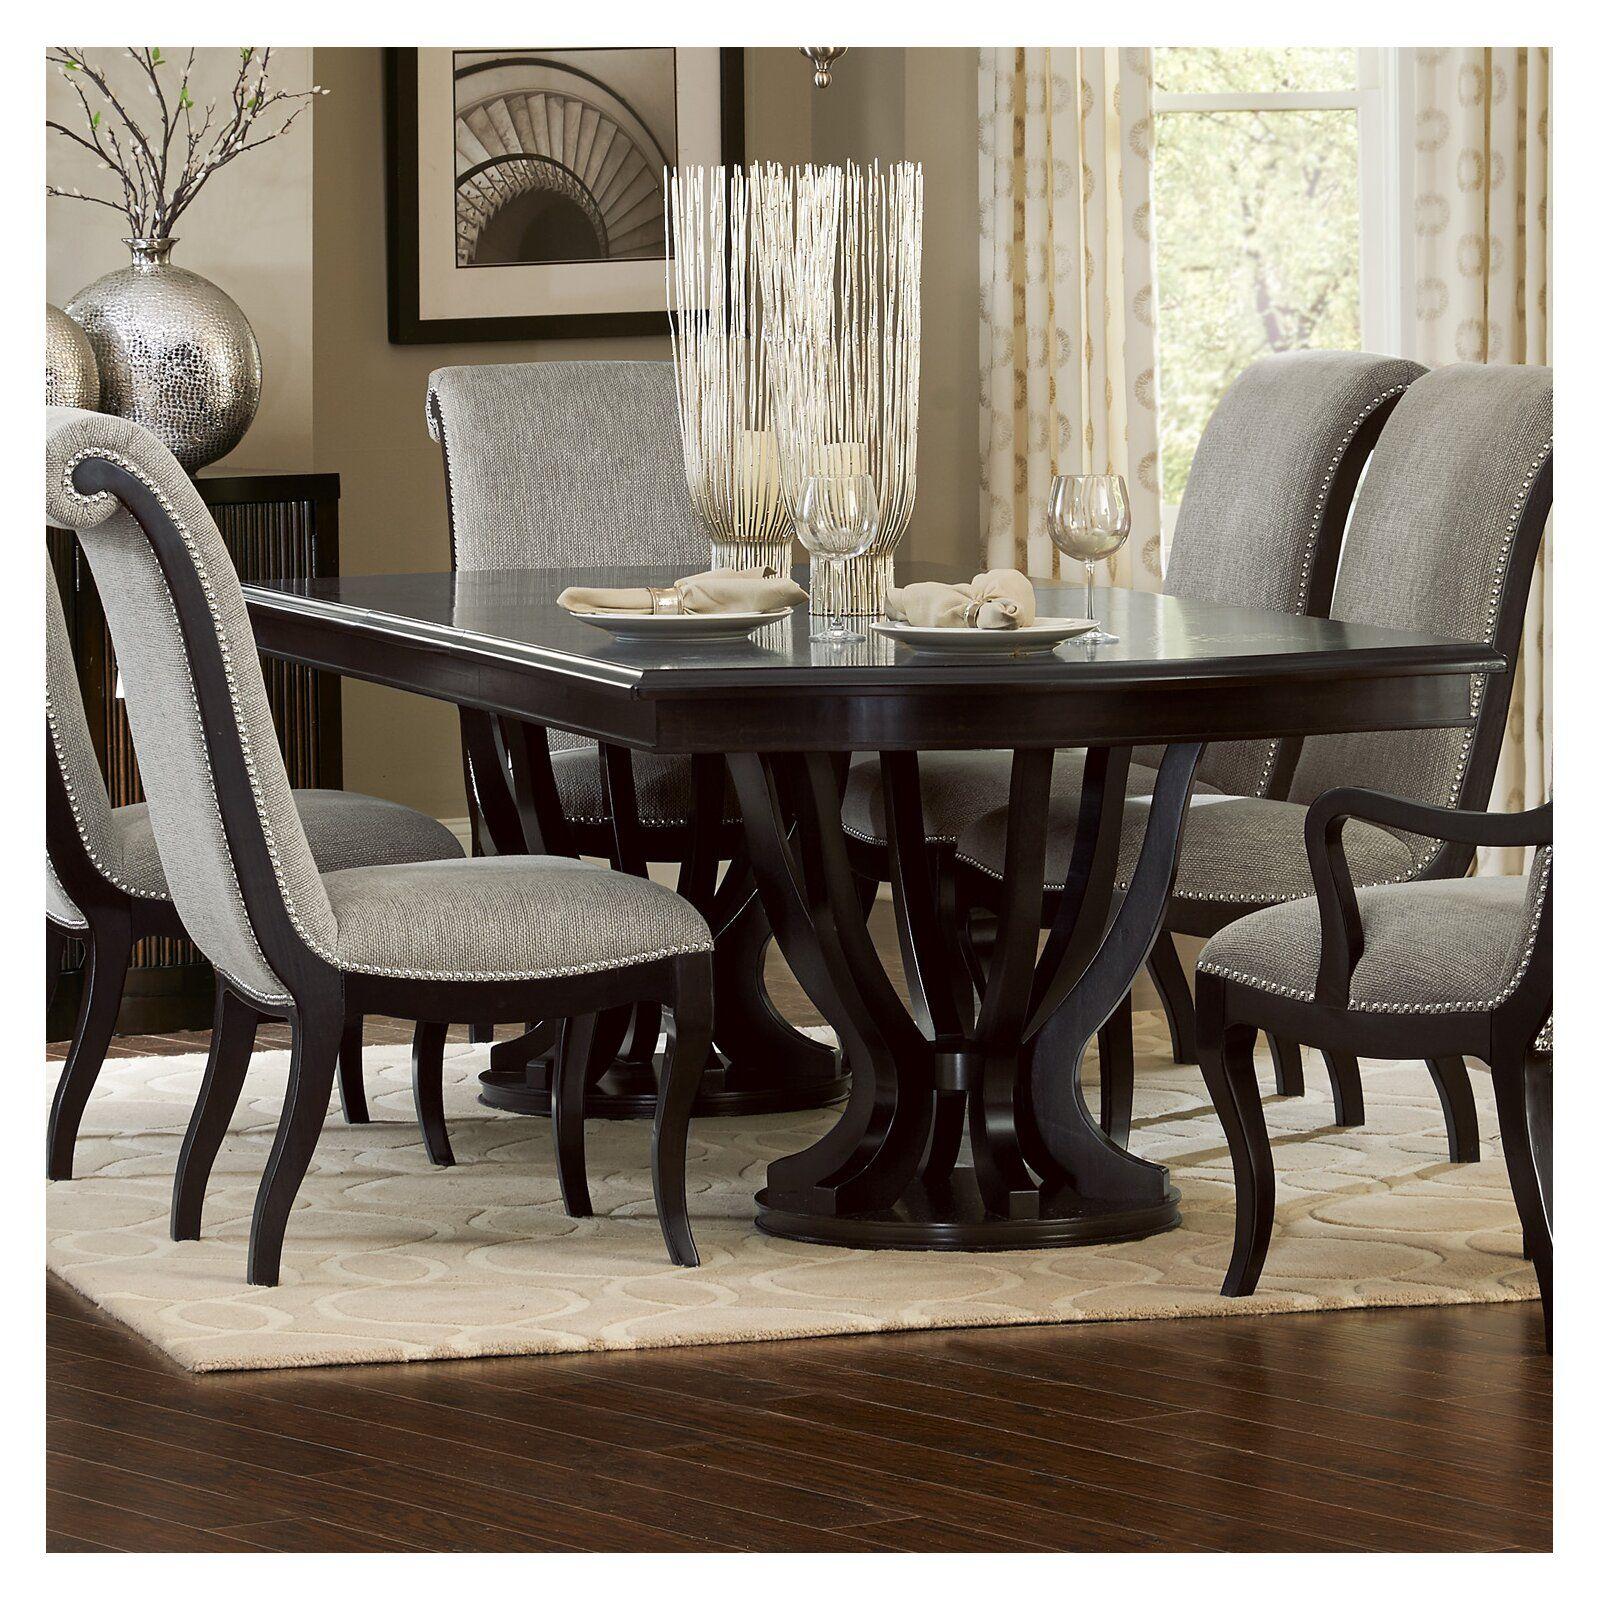 Canora Grey Baypoint Dining Table Wayfair Double Pedestal